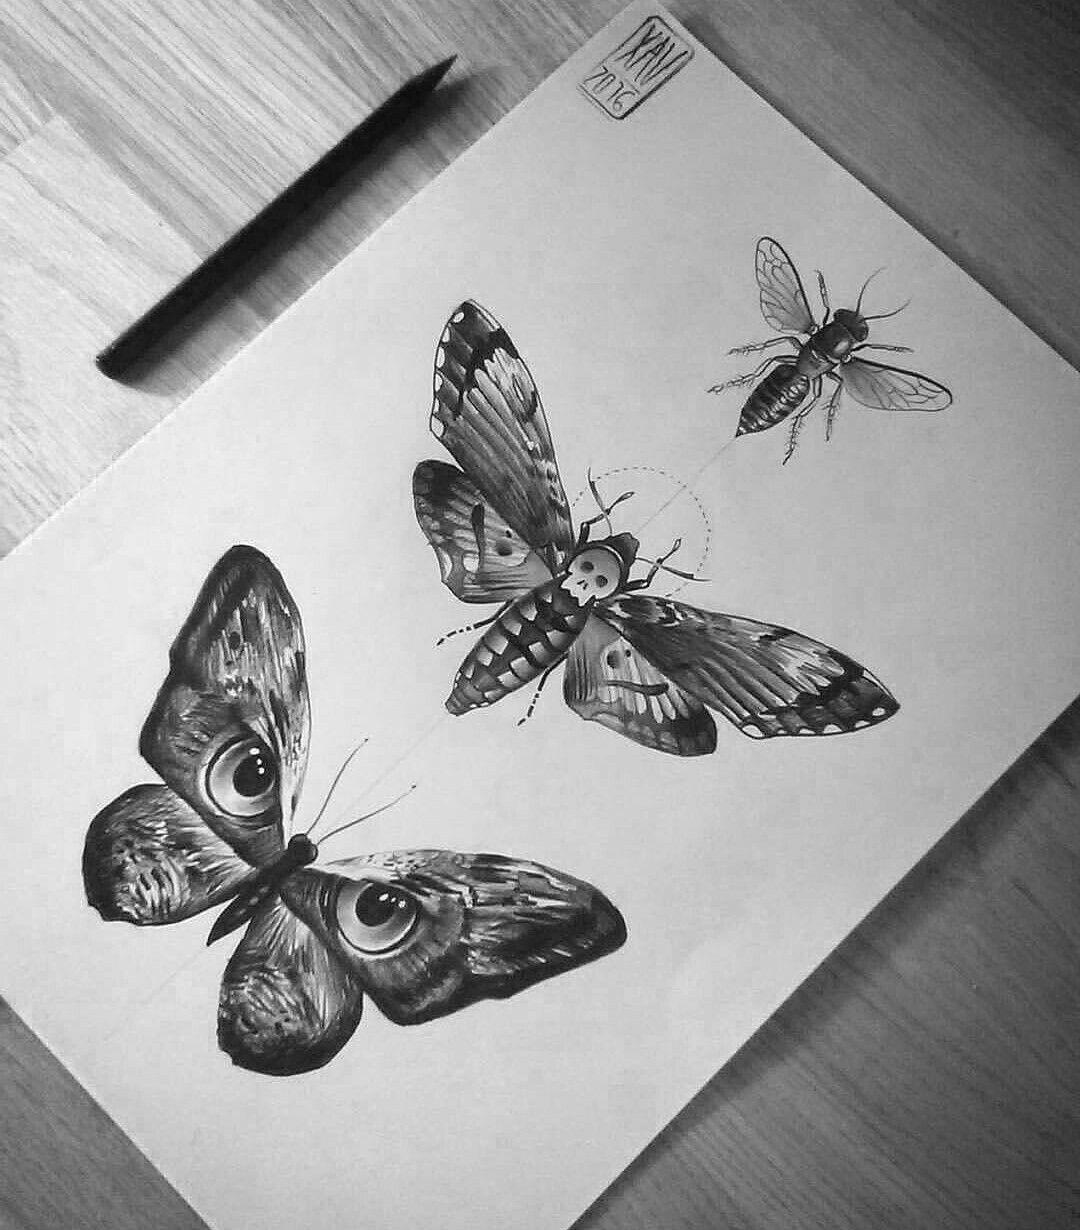 Pin by Sami Rammelsberg on tattoos Ink pen drawings